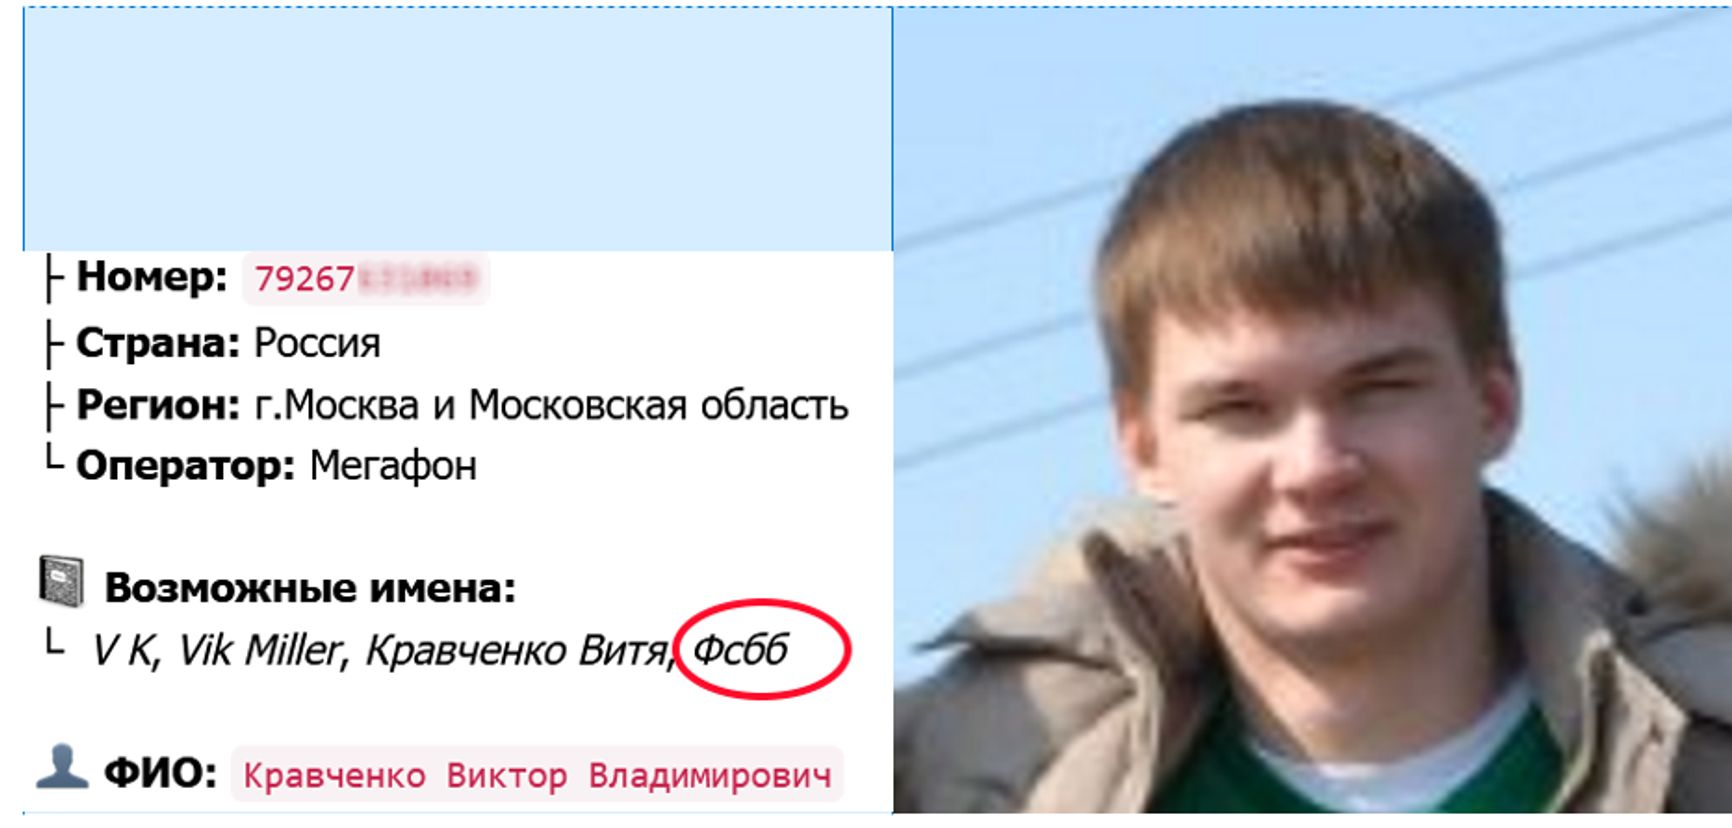 Слева на фото видно, под какими именами заносили в свои контакты на телефоне номер Кравченко